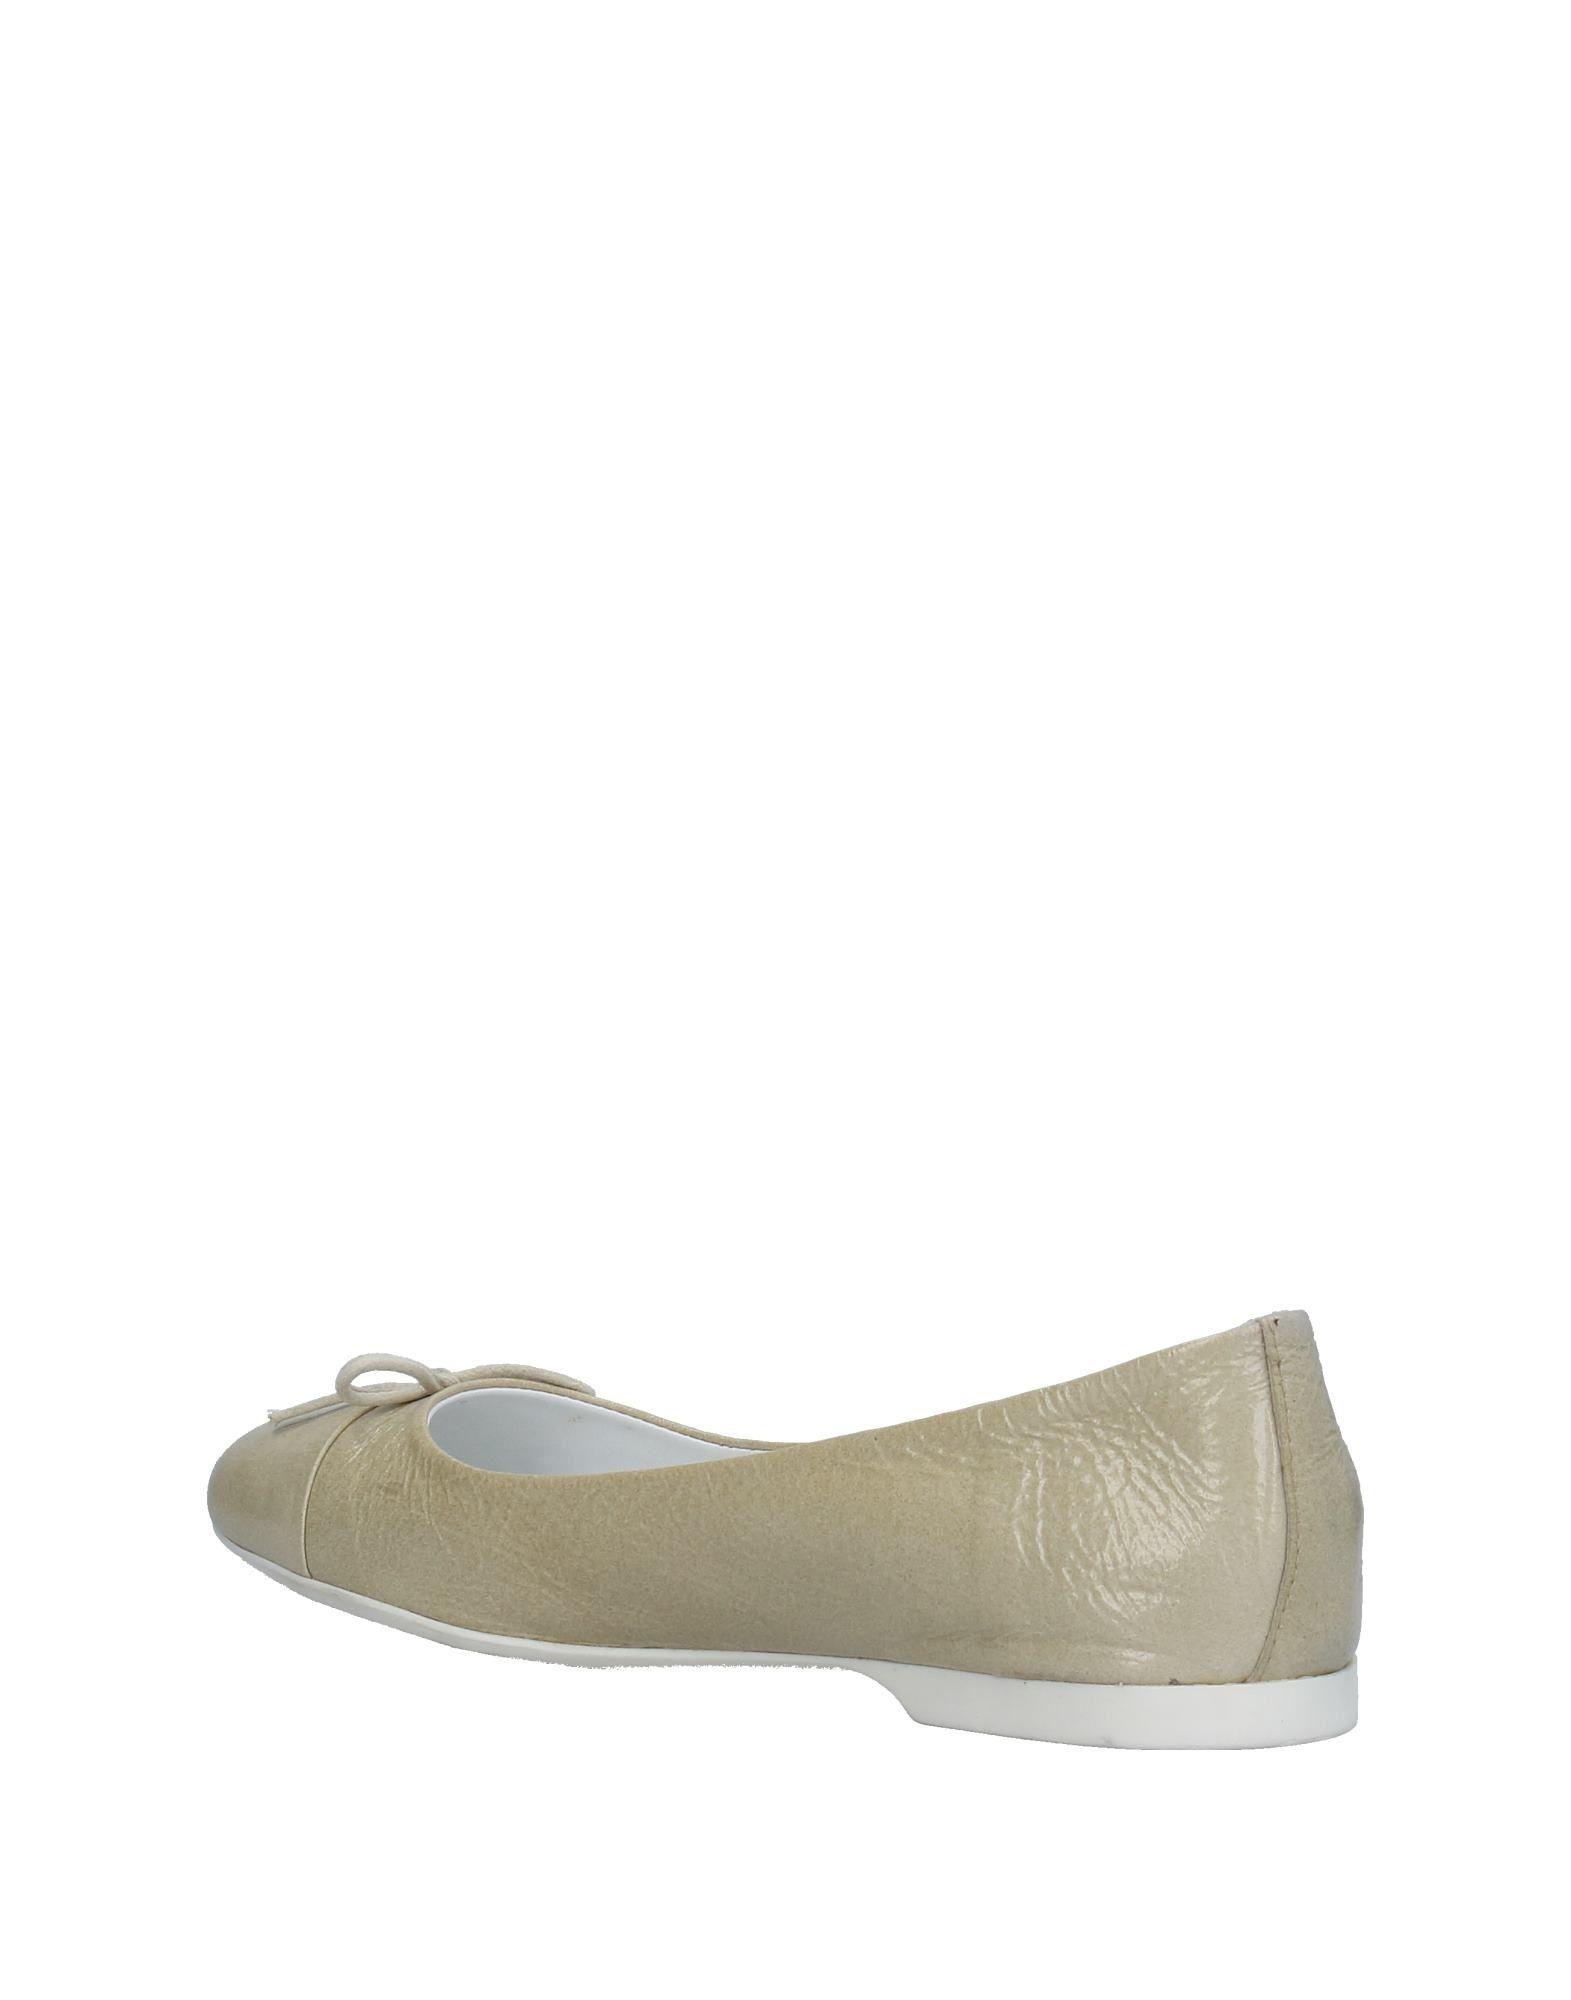 Chaussures - Ballerines Botticelli Limitée 275ozOgbs